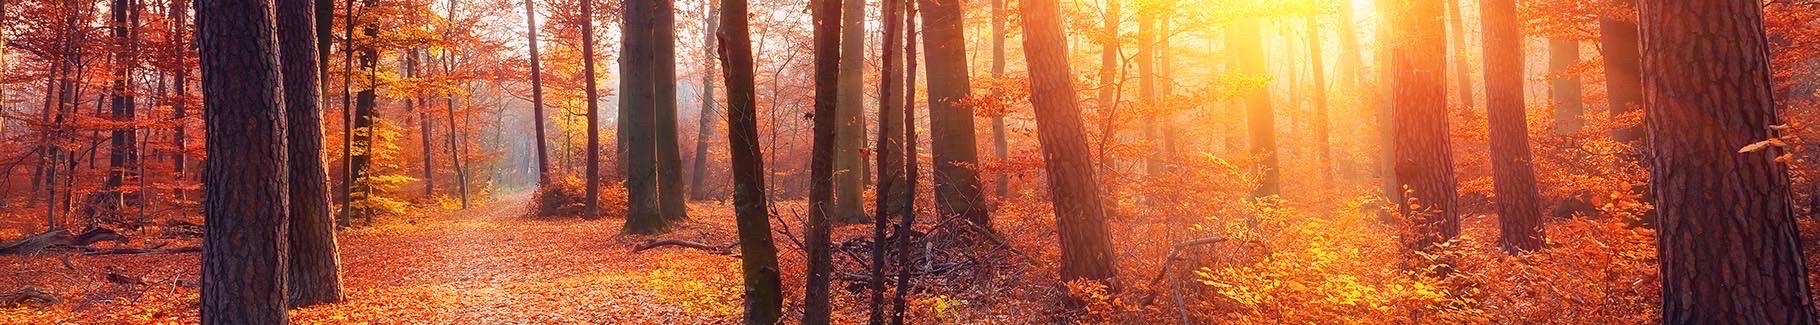 Fototapeta park jesienią